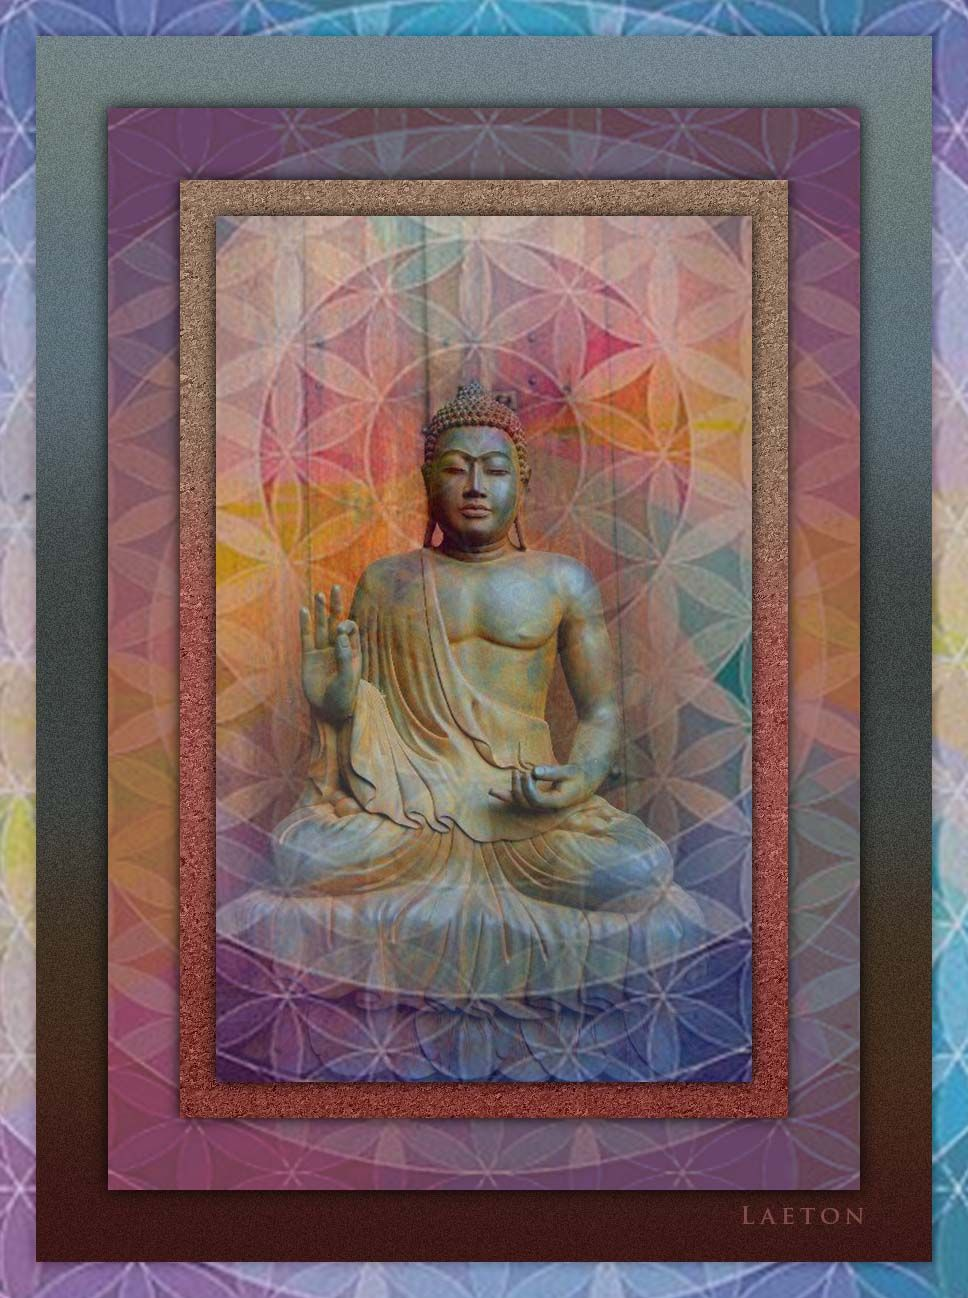 Richard Laeton ~ http://fineartamerica.com/featured/1-buddha-richard-laeton.html